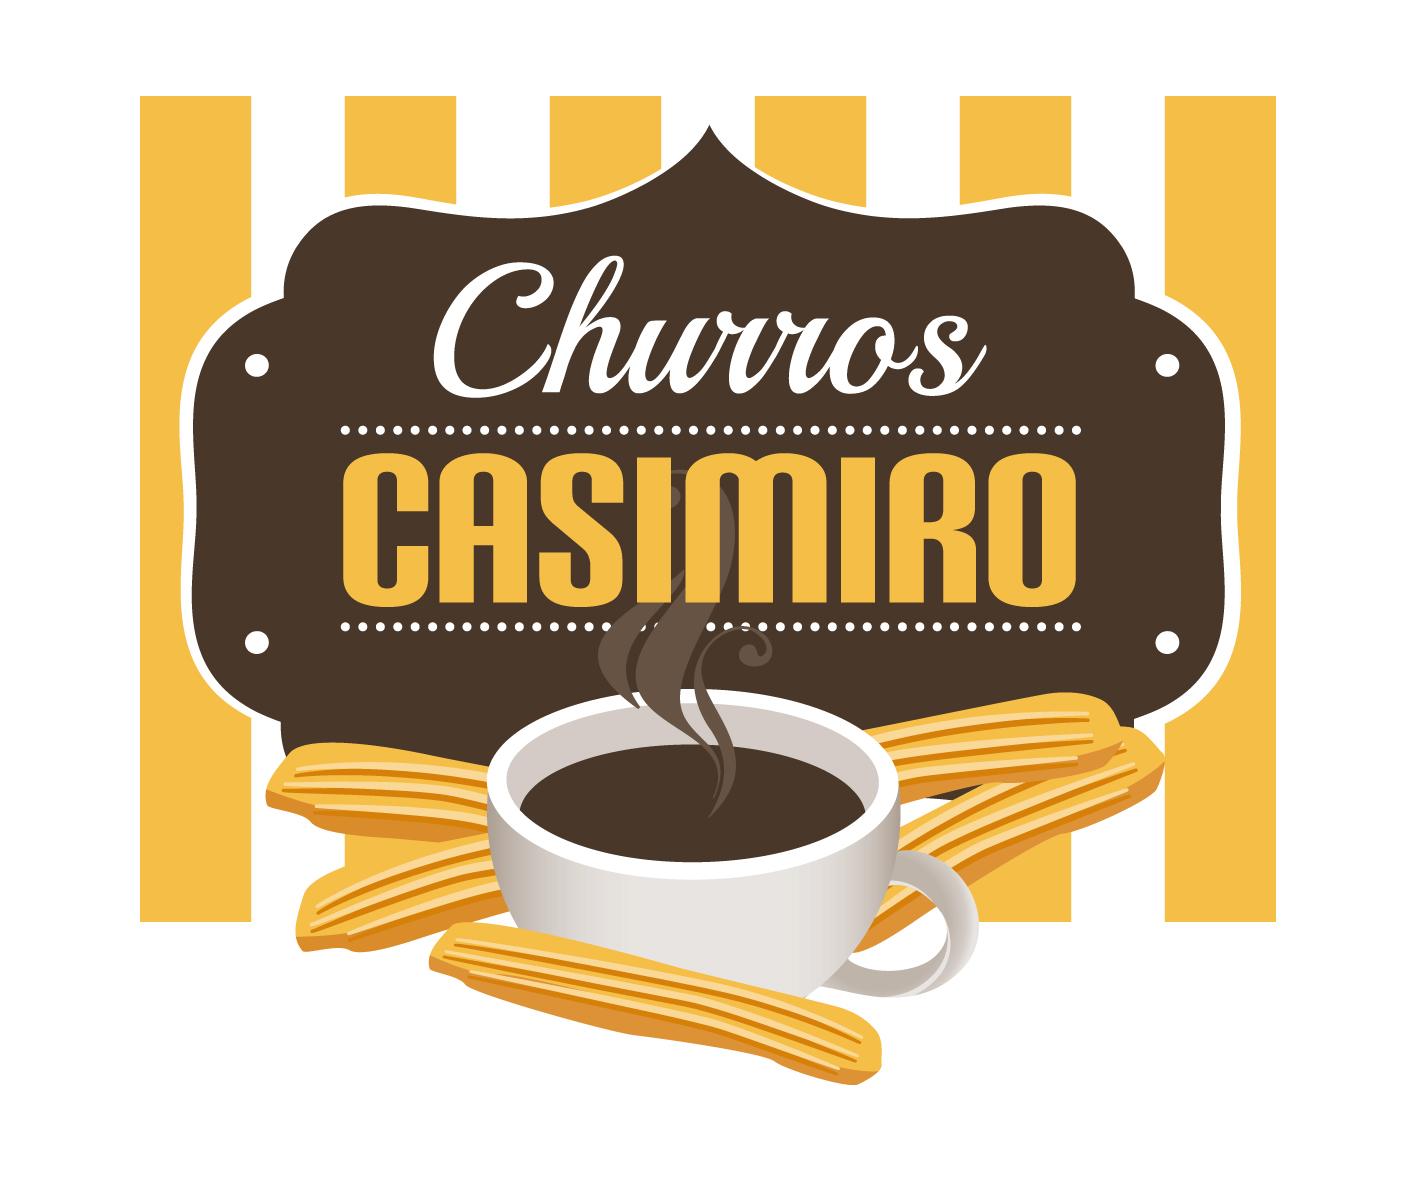 CHURROS CASIMIRO